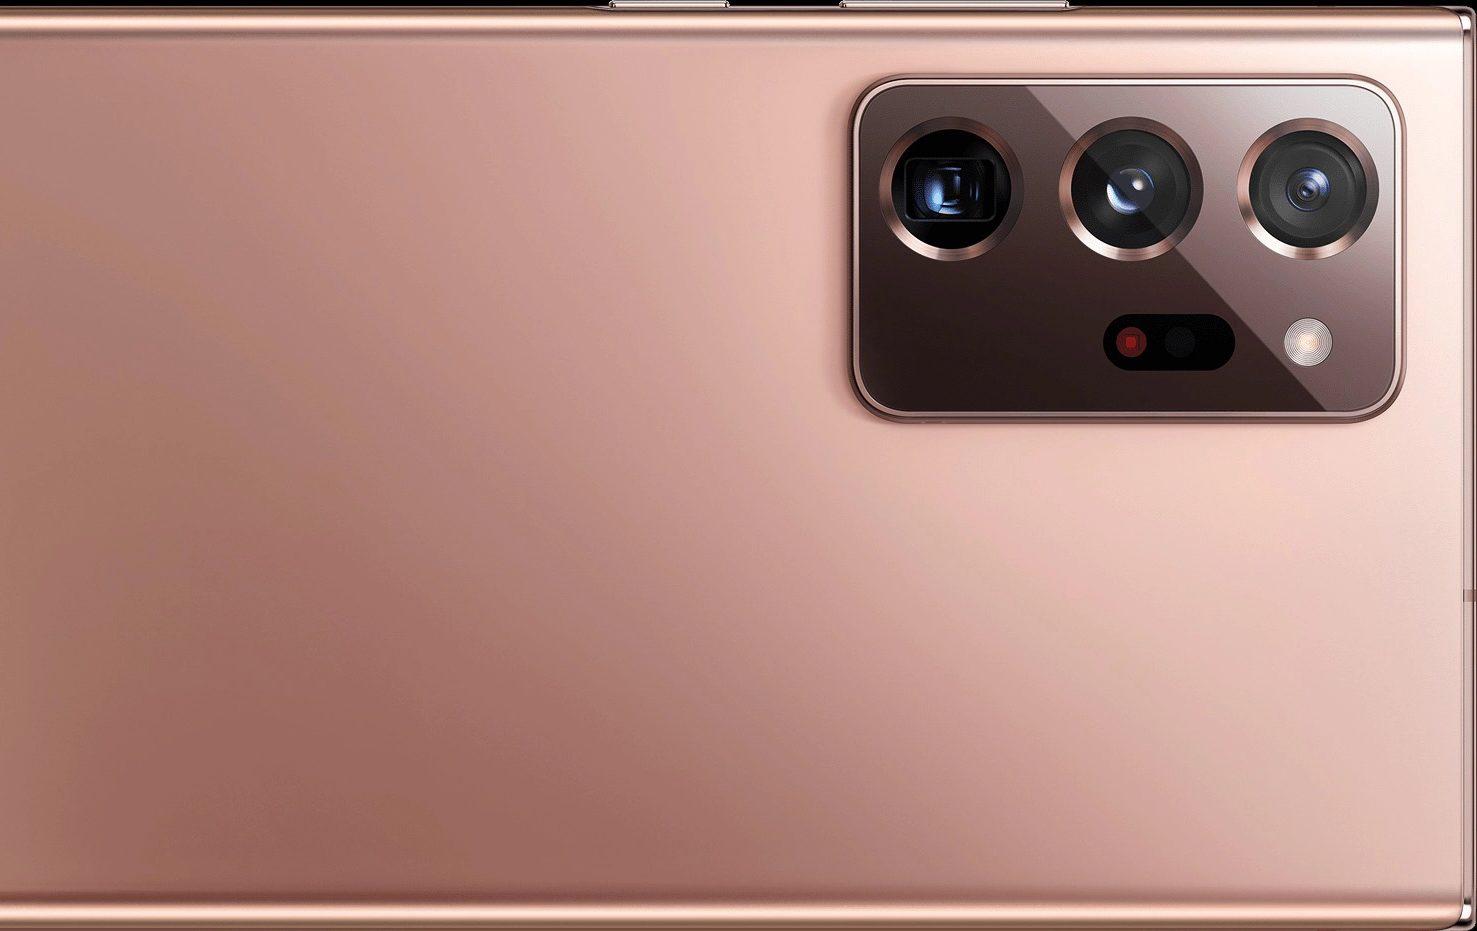 Samsung Galaxy Note 20 Ultra – Camera